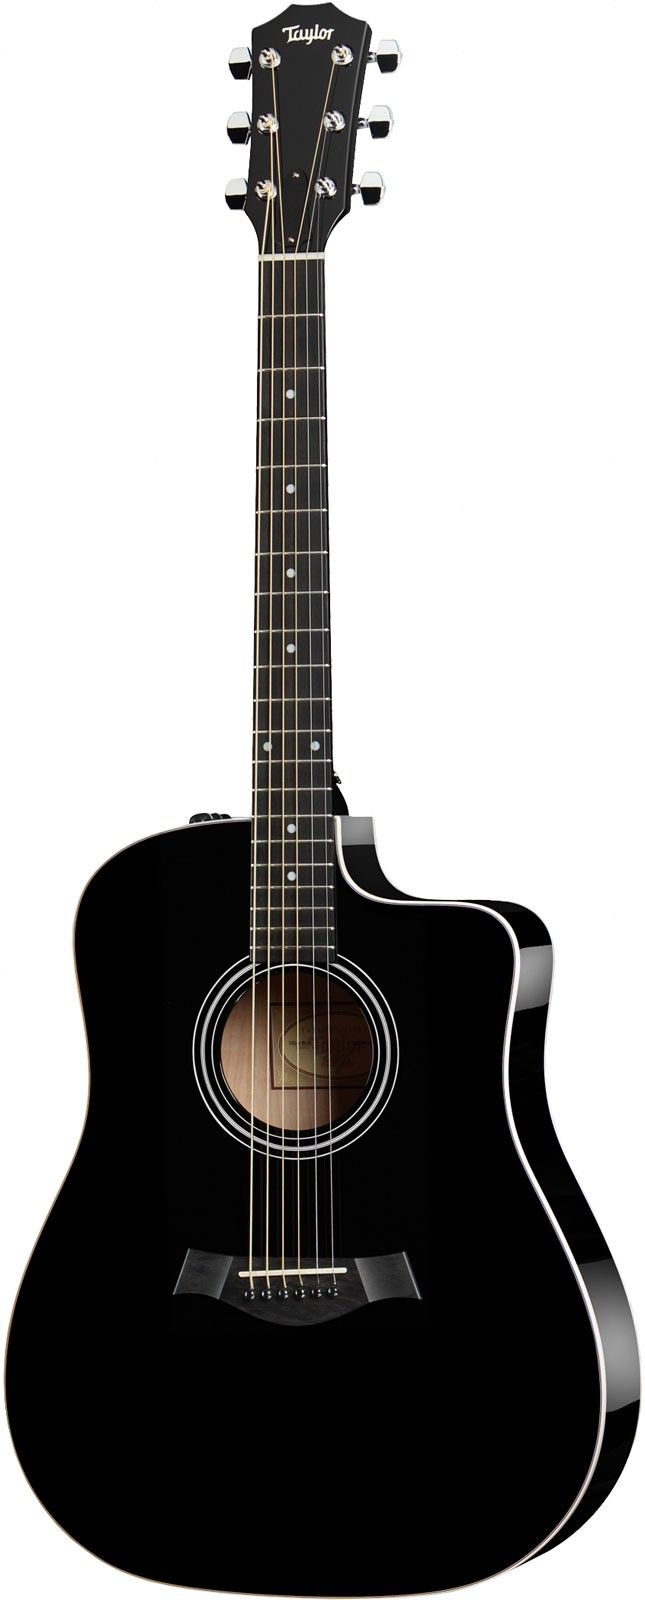 Taylor 210CE Black Cutaway Electro Acoustic Guitar #taylor #acoustic #guitar